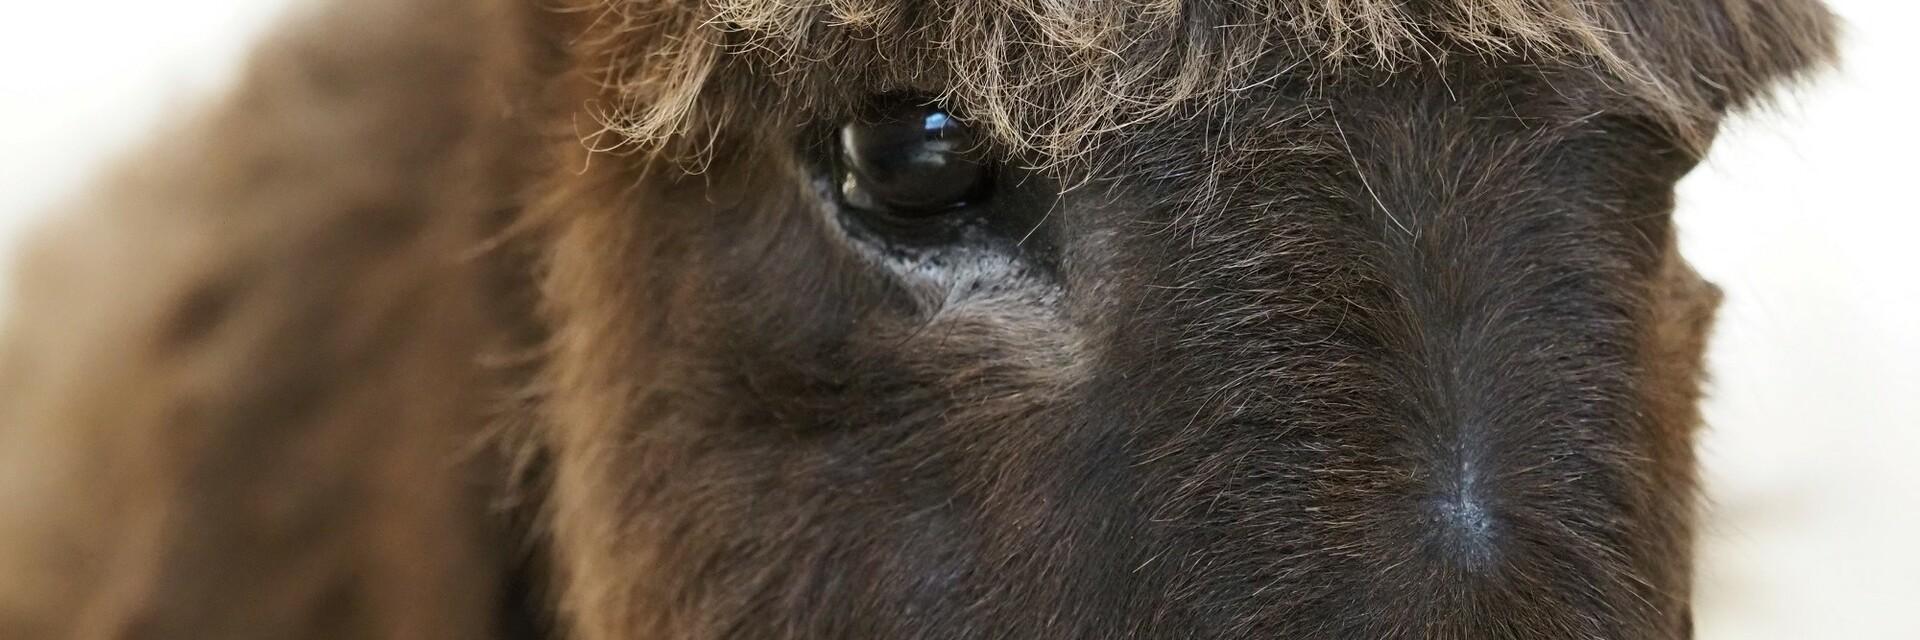 Donkey Puica